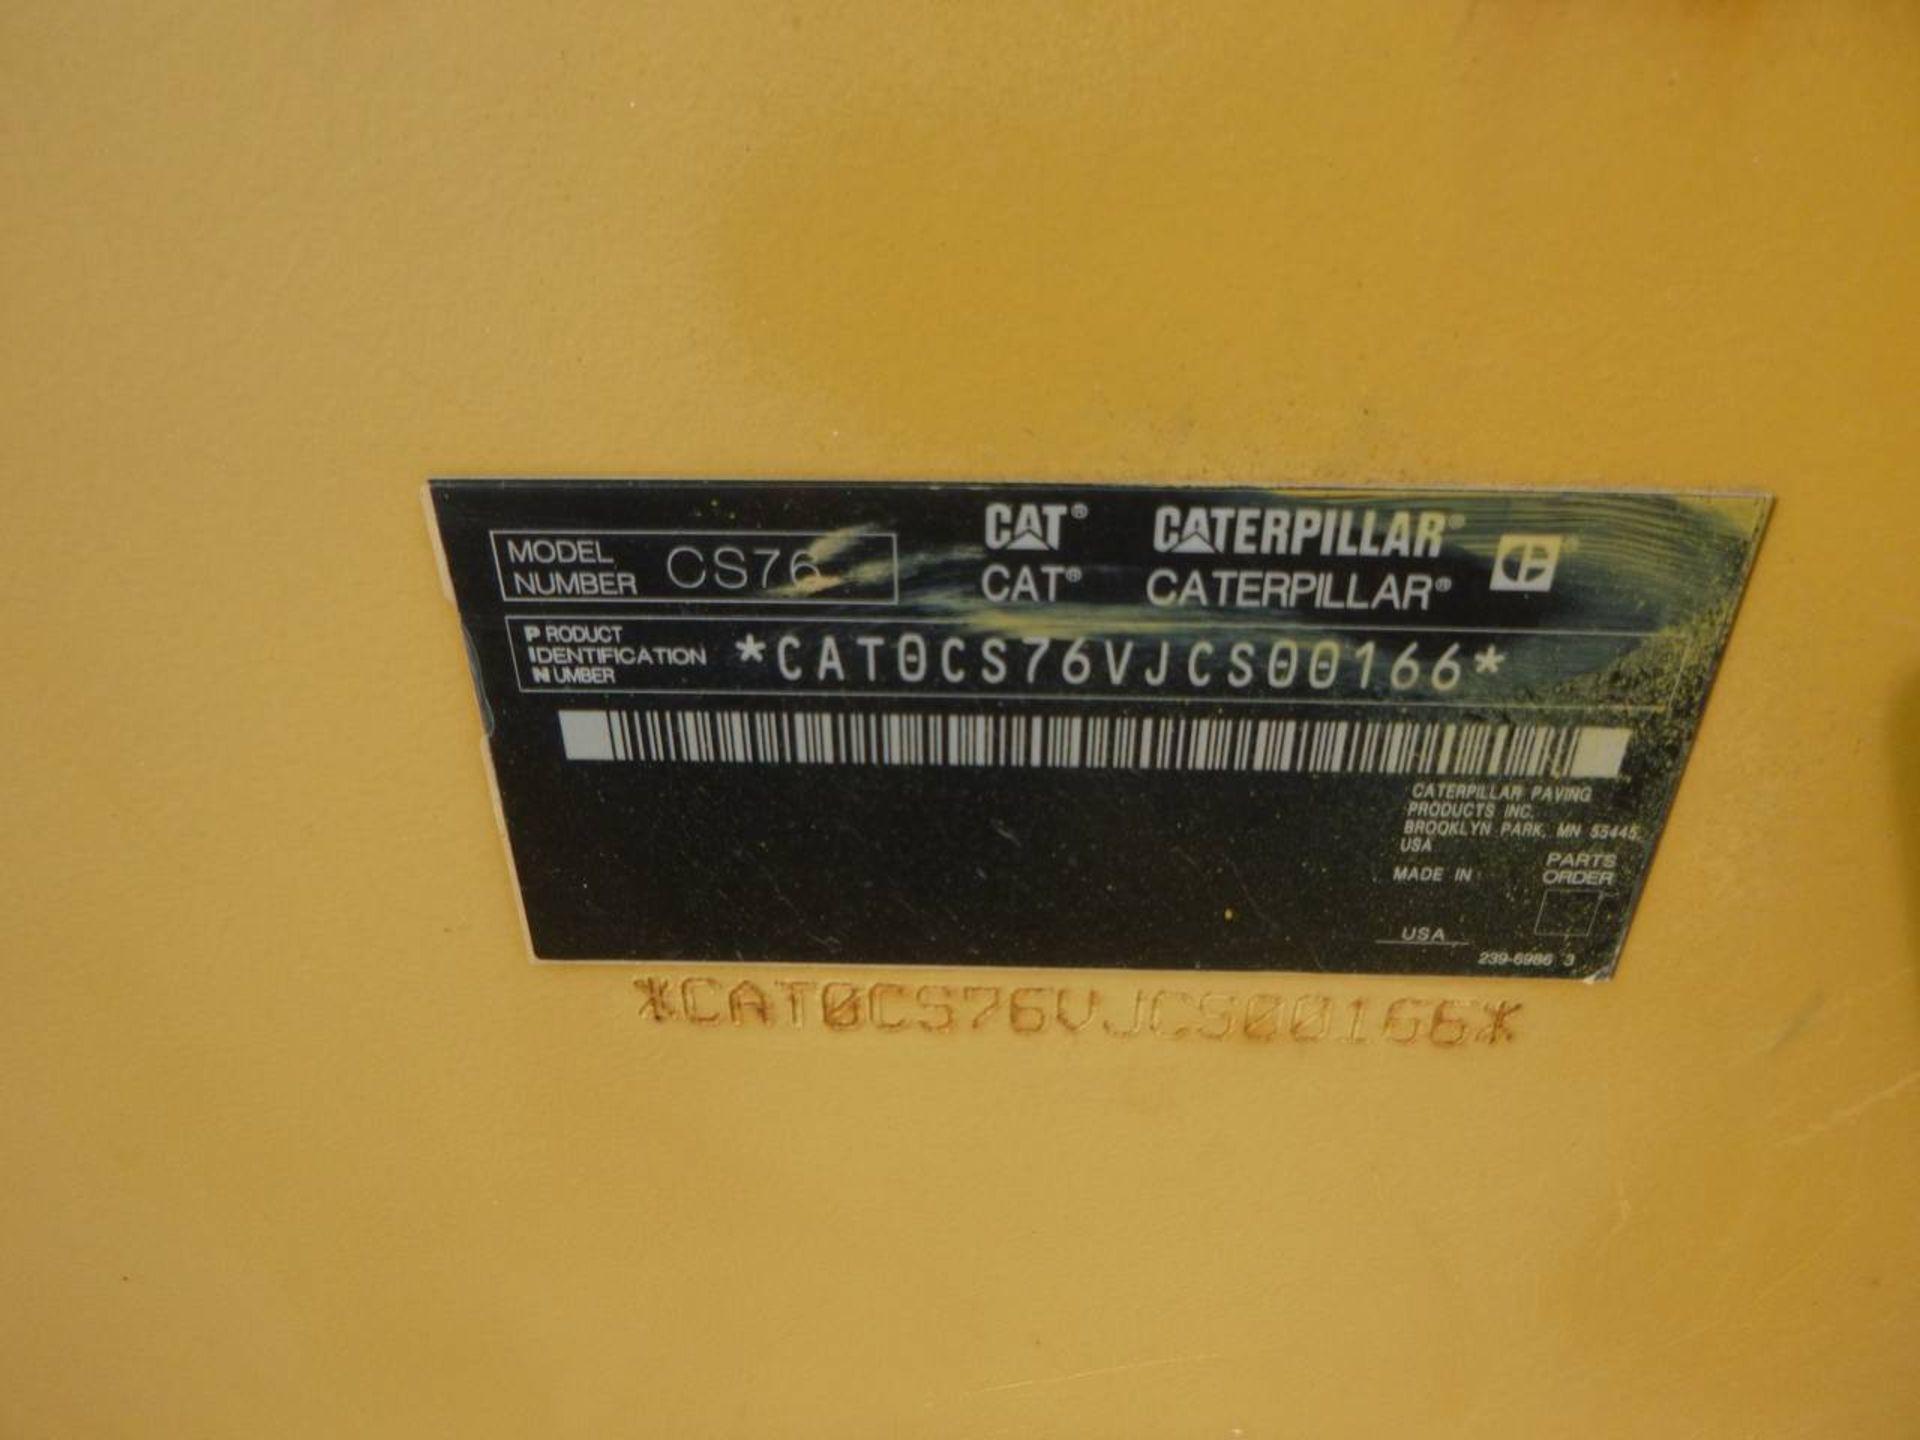 2011 Caterpillar CS76 Compactor - Image 9 of 9